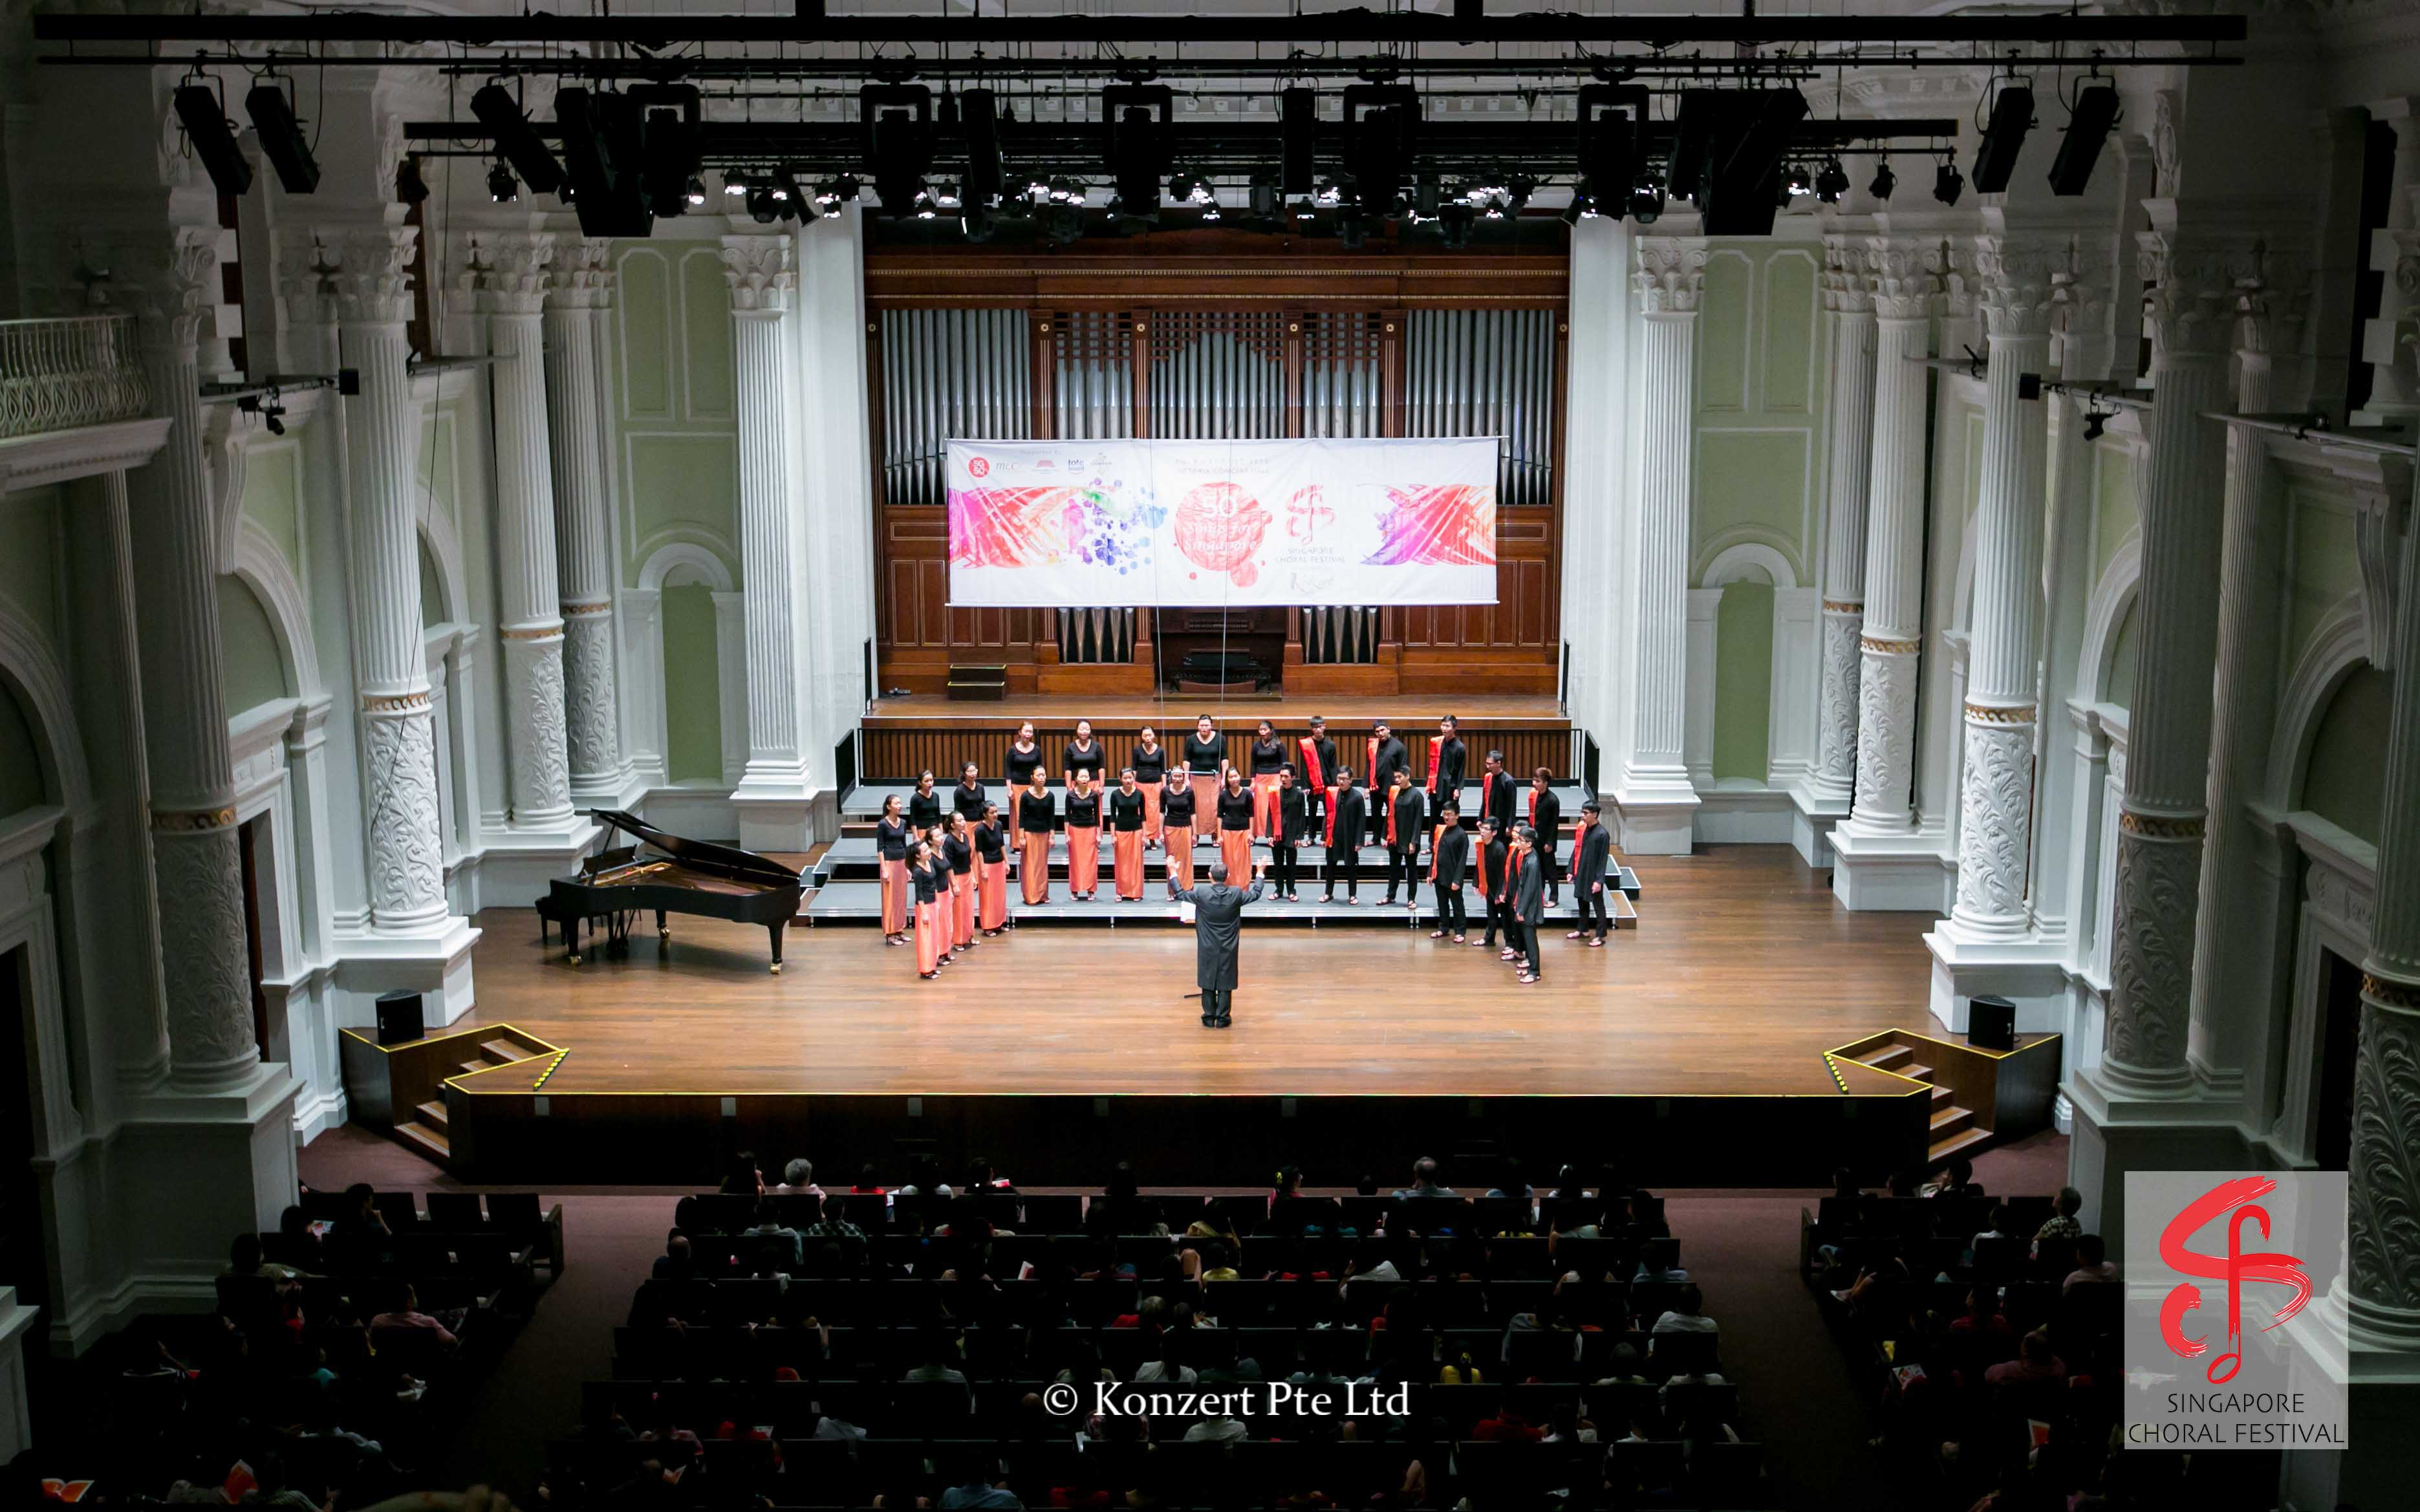 Singapore Choral Festival 7-8-15 (291).jpg